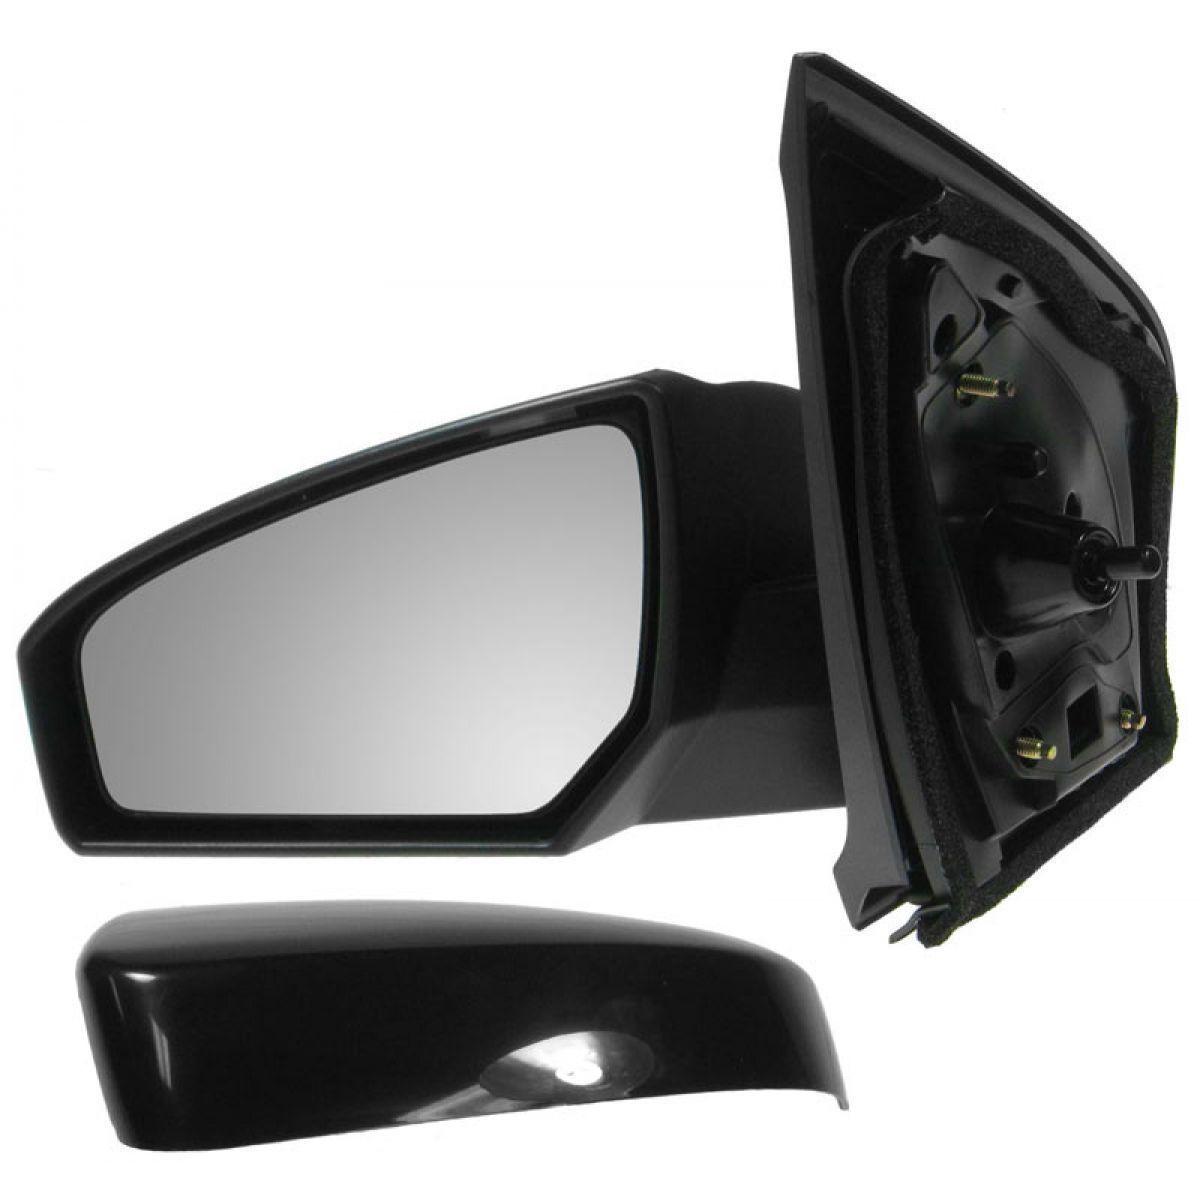 USミラー 永久保証付き07-12日産セントラの新しいマニュアルドライバサイドミラー New Manual Drivers Side Mirror for a 07-12 Nissan Sentra With Lifetime Warranty